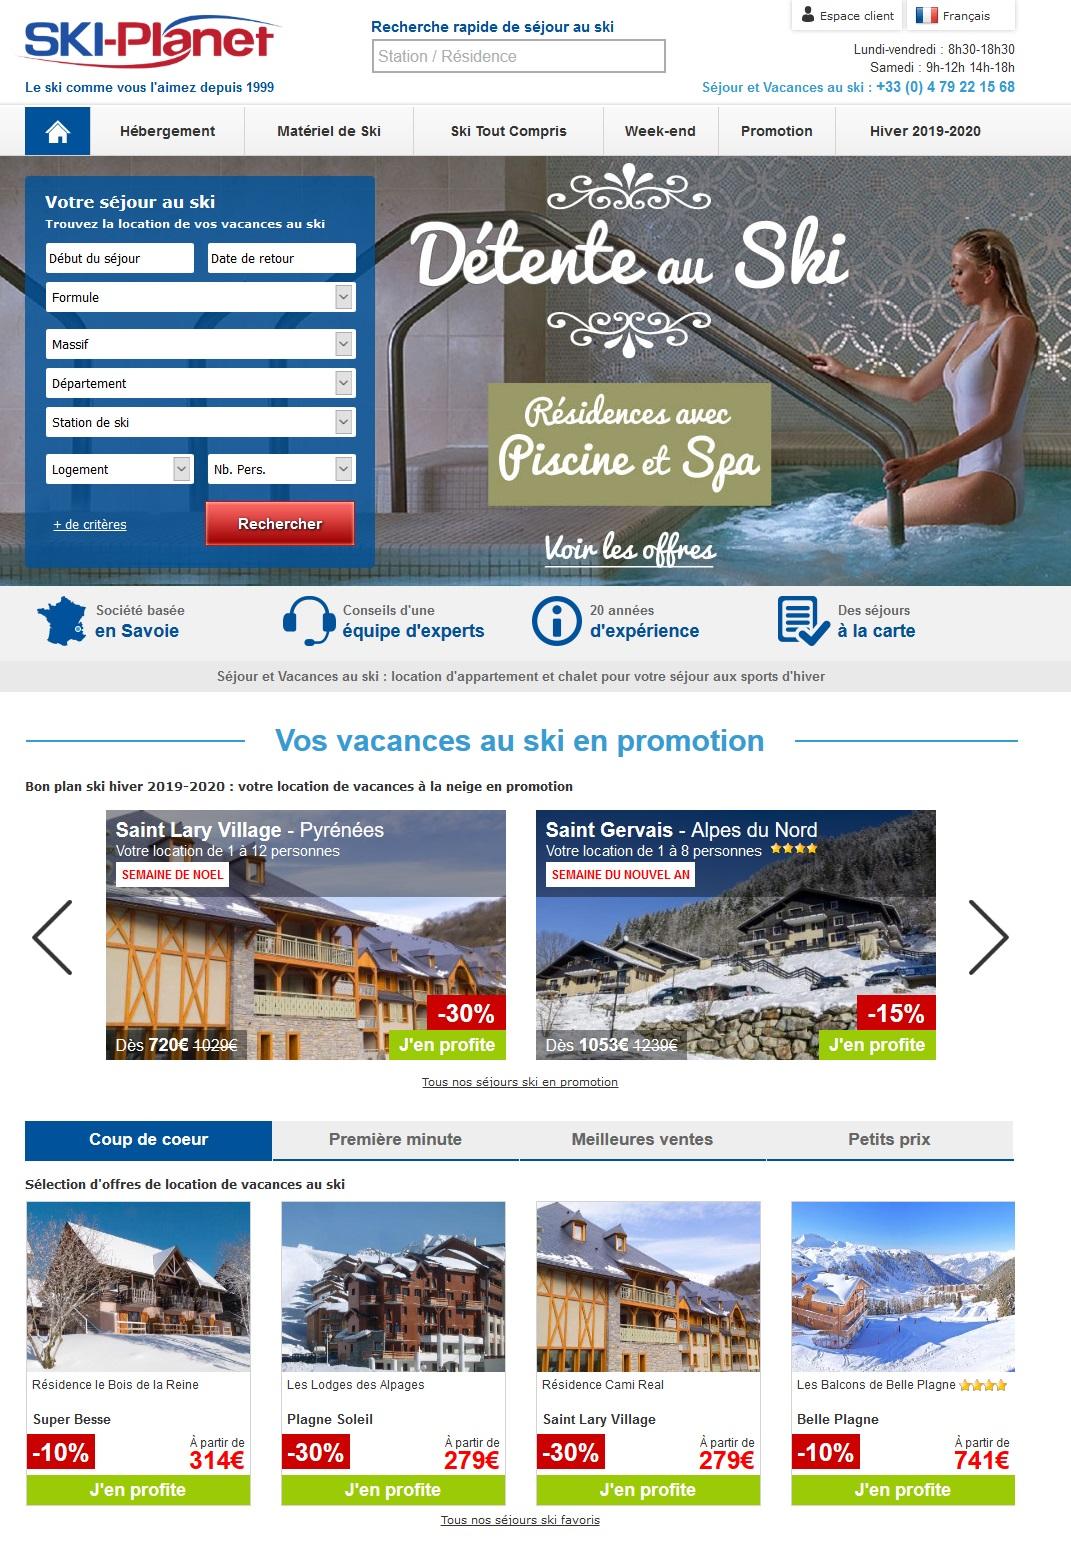 Ski Planet vacances au ski